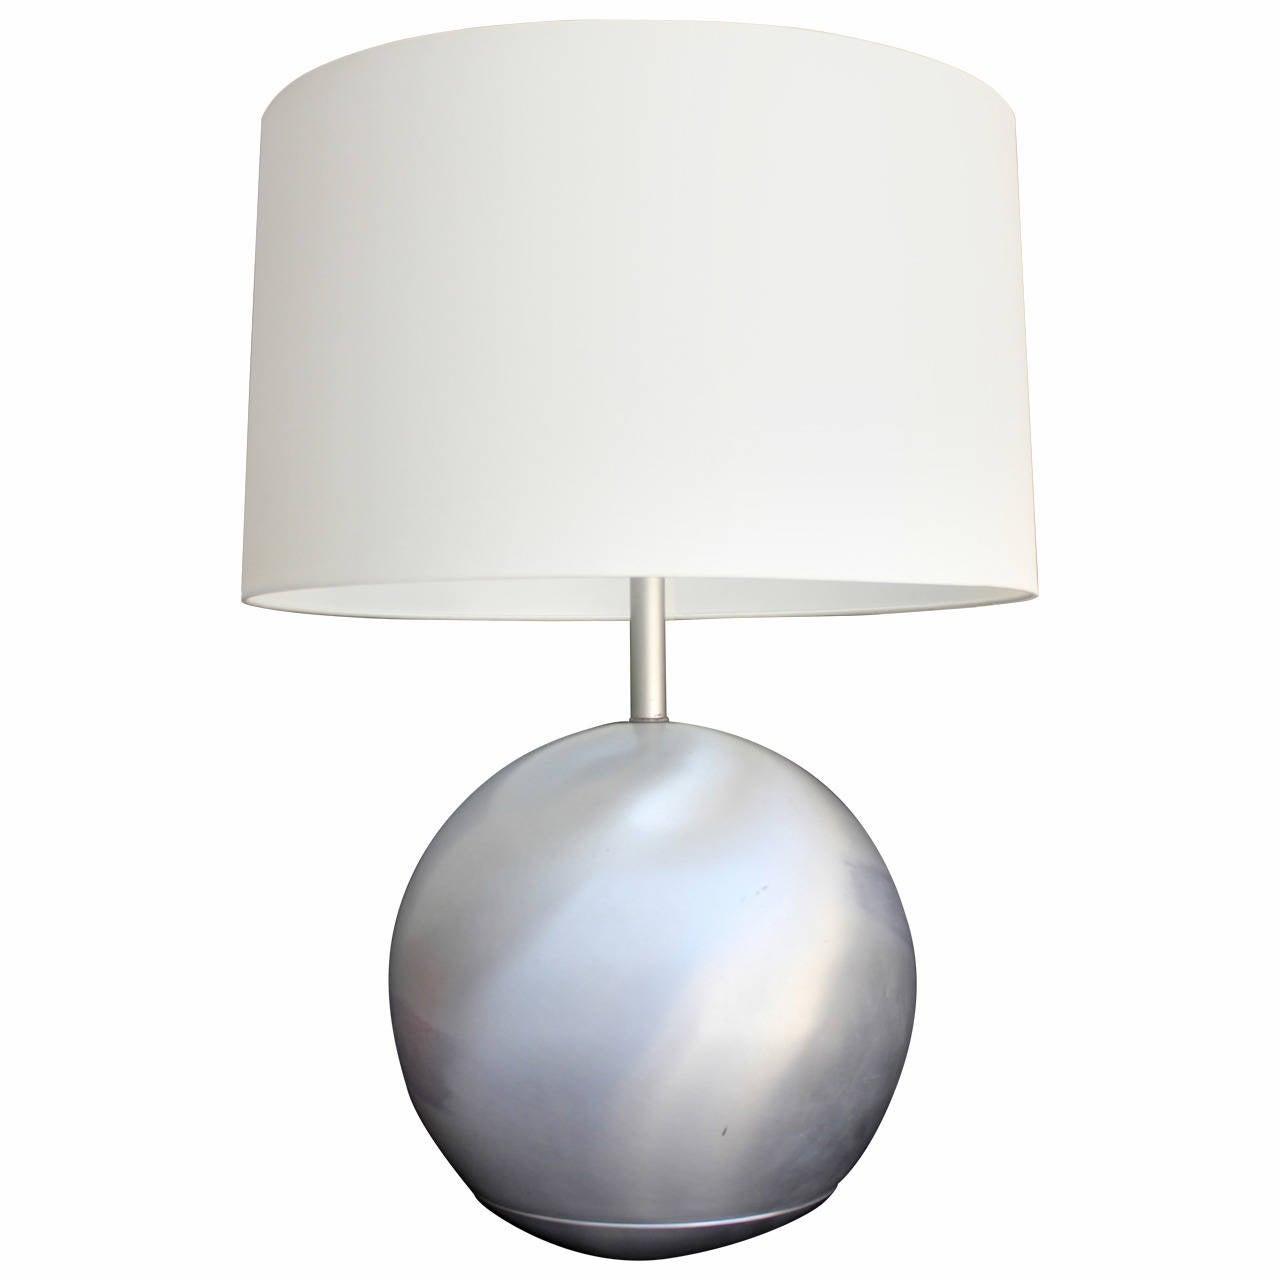 16 Inch Russel Wright Spun Aluminum Lamp